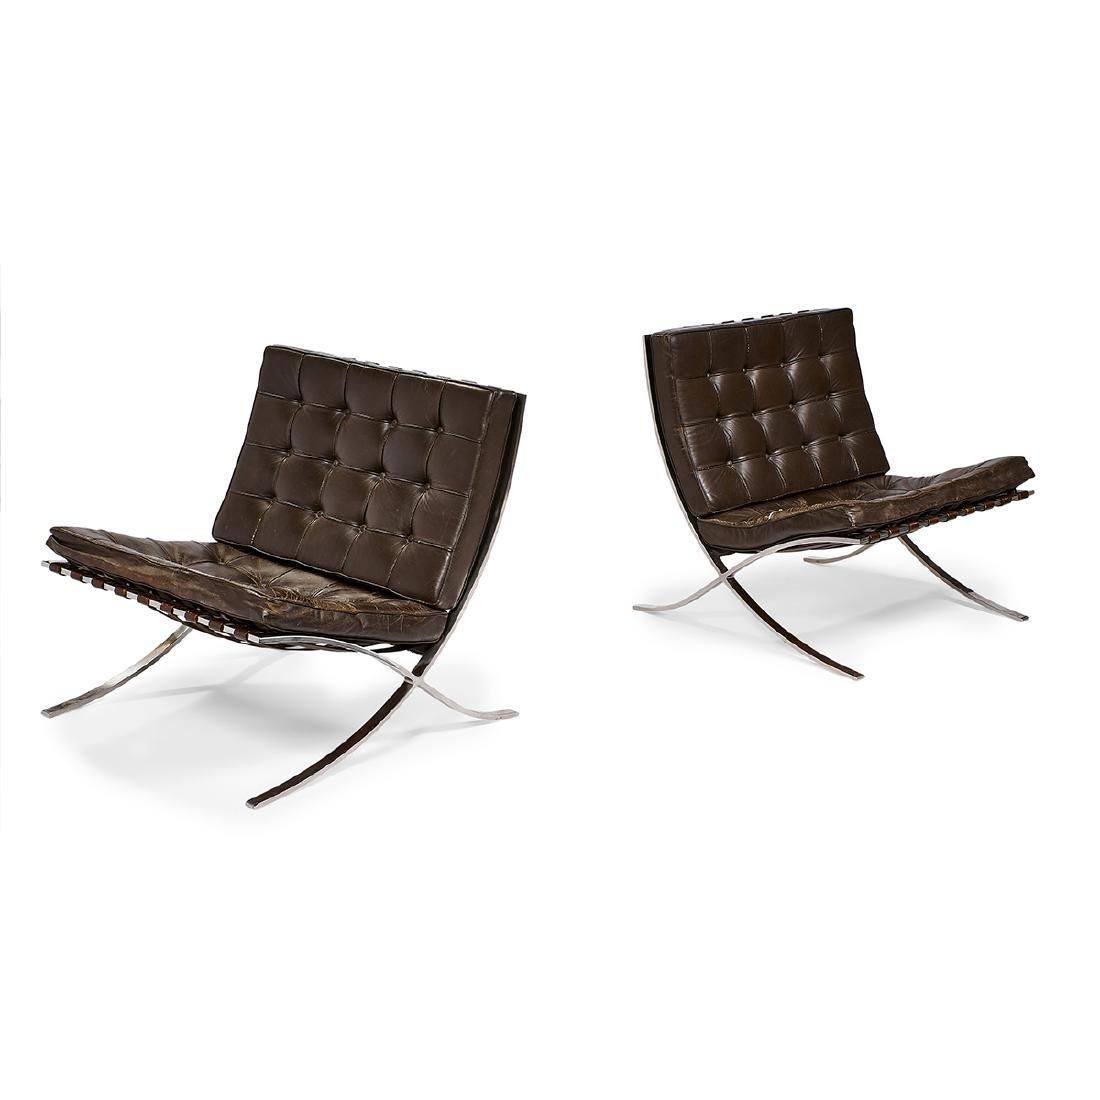 Mies van der Rohe / Knoll Assoc. Barcelona chairs